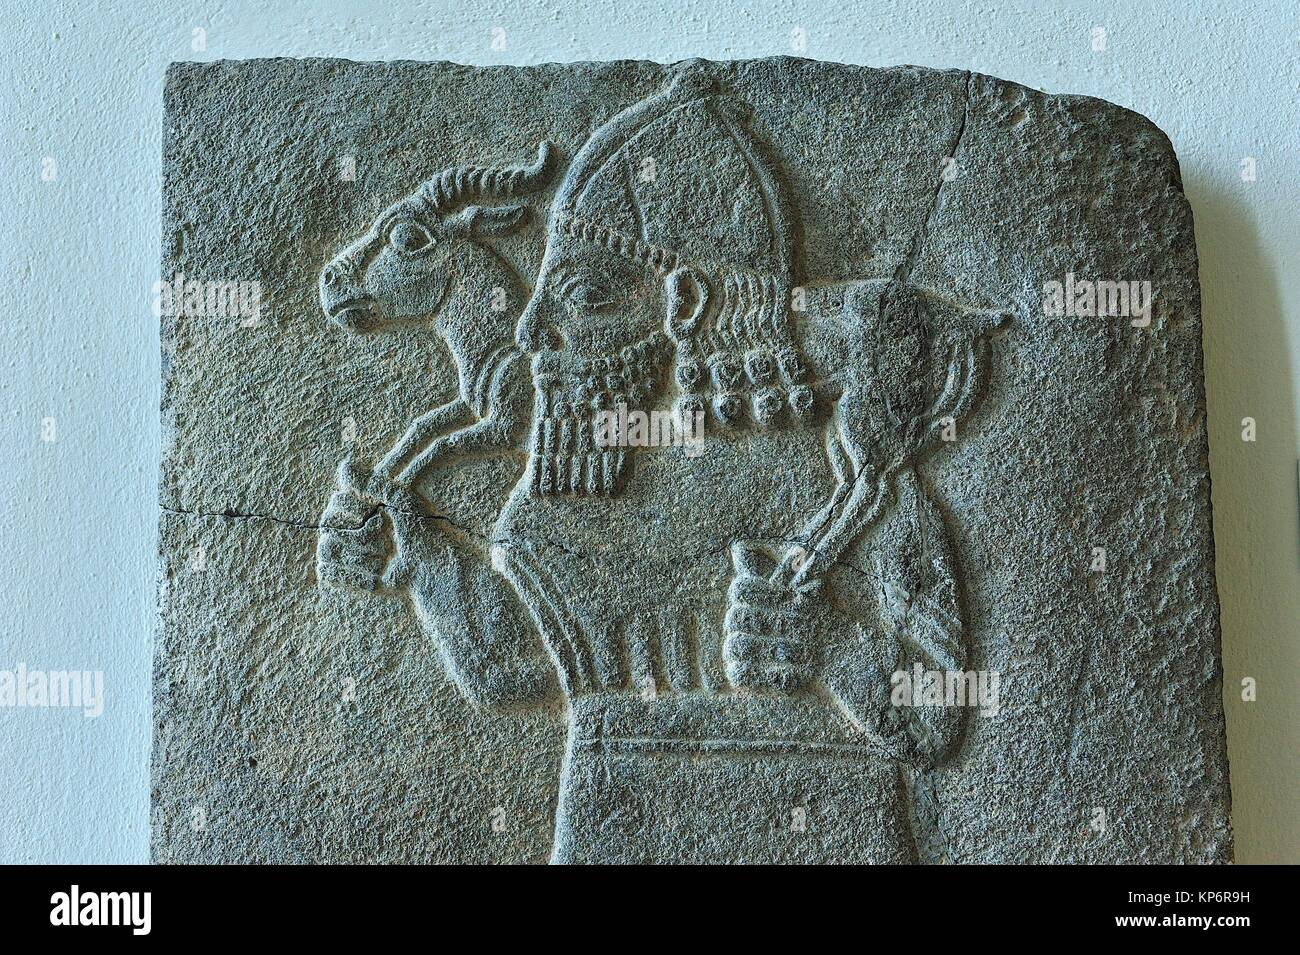 Hittite art: orthostat relief showing a man carrying a gazelle (Zincirli, 8th century BC), Pergamon Museum, Berlin, Stock Photo